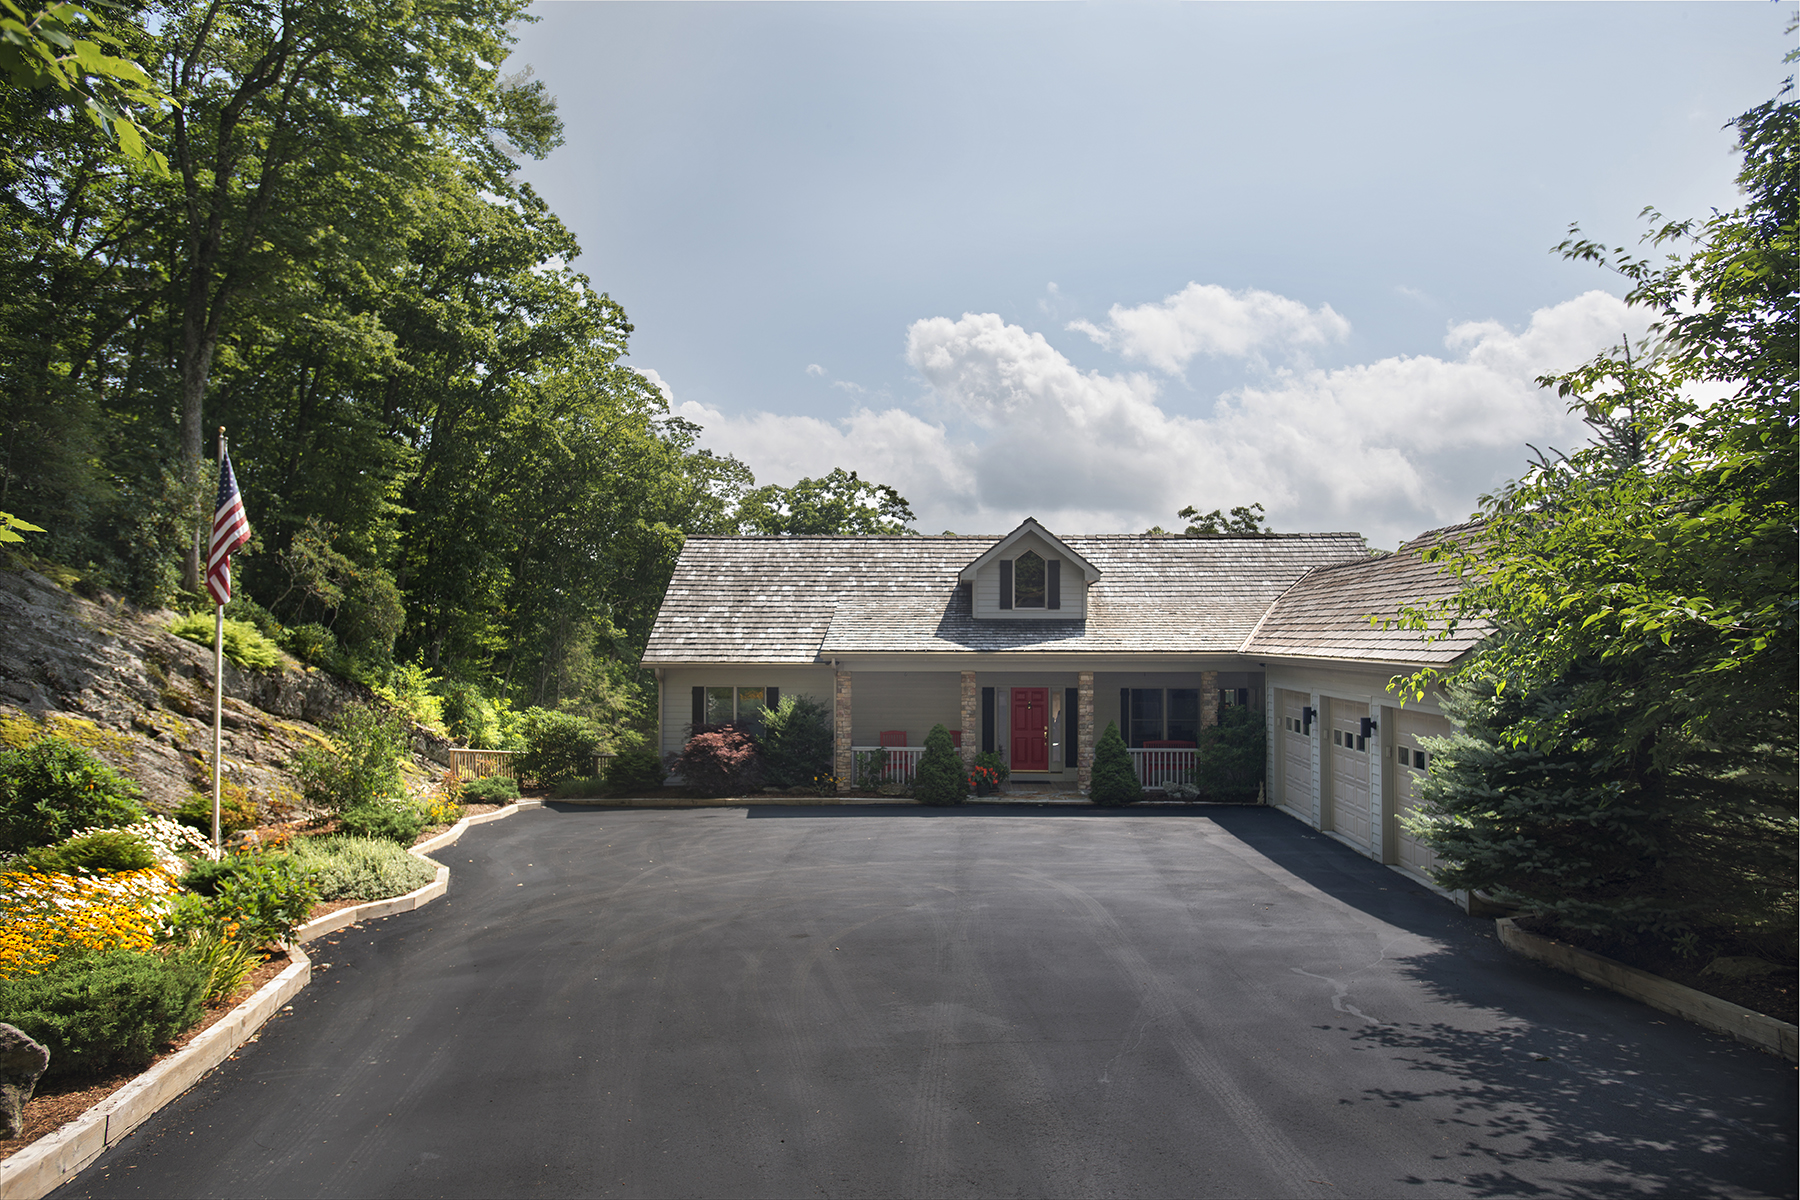 Single Family Home for Sale at LINVILLE - LINVILLE RIDGE 634 Chestnut Trail 34 Linville, North Carolina, 28646 United States